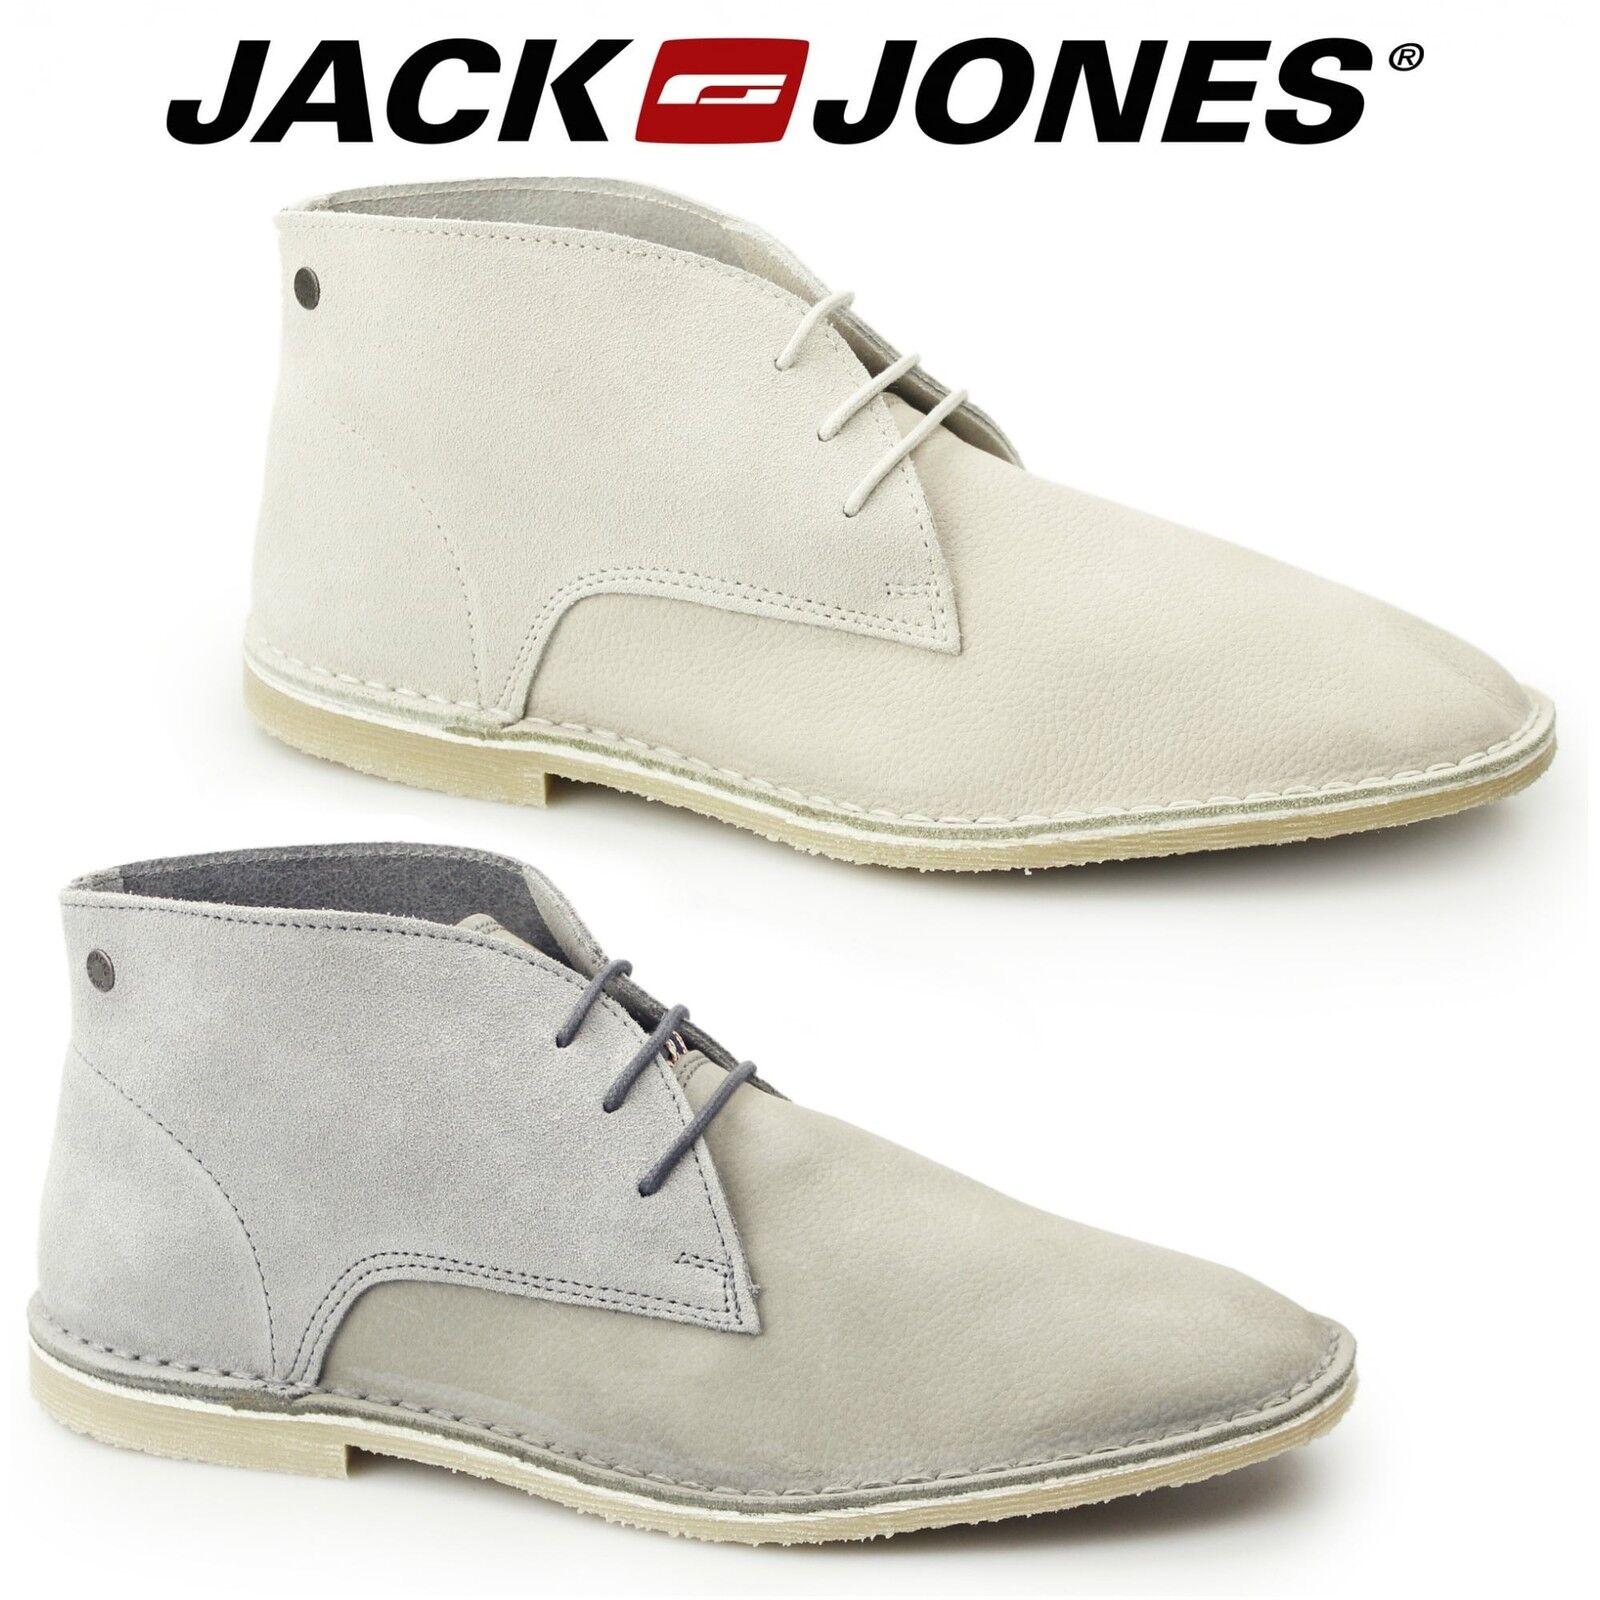 Jack & Jones DAMON Mens Suede Nubuck Leather Lace Up Casual Comfy Desert Stiefel